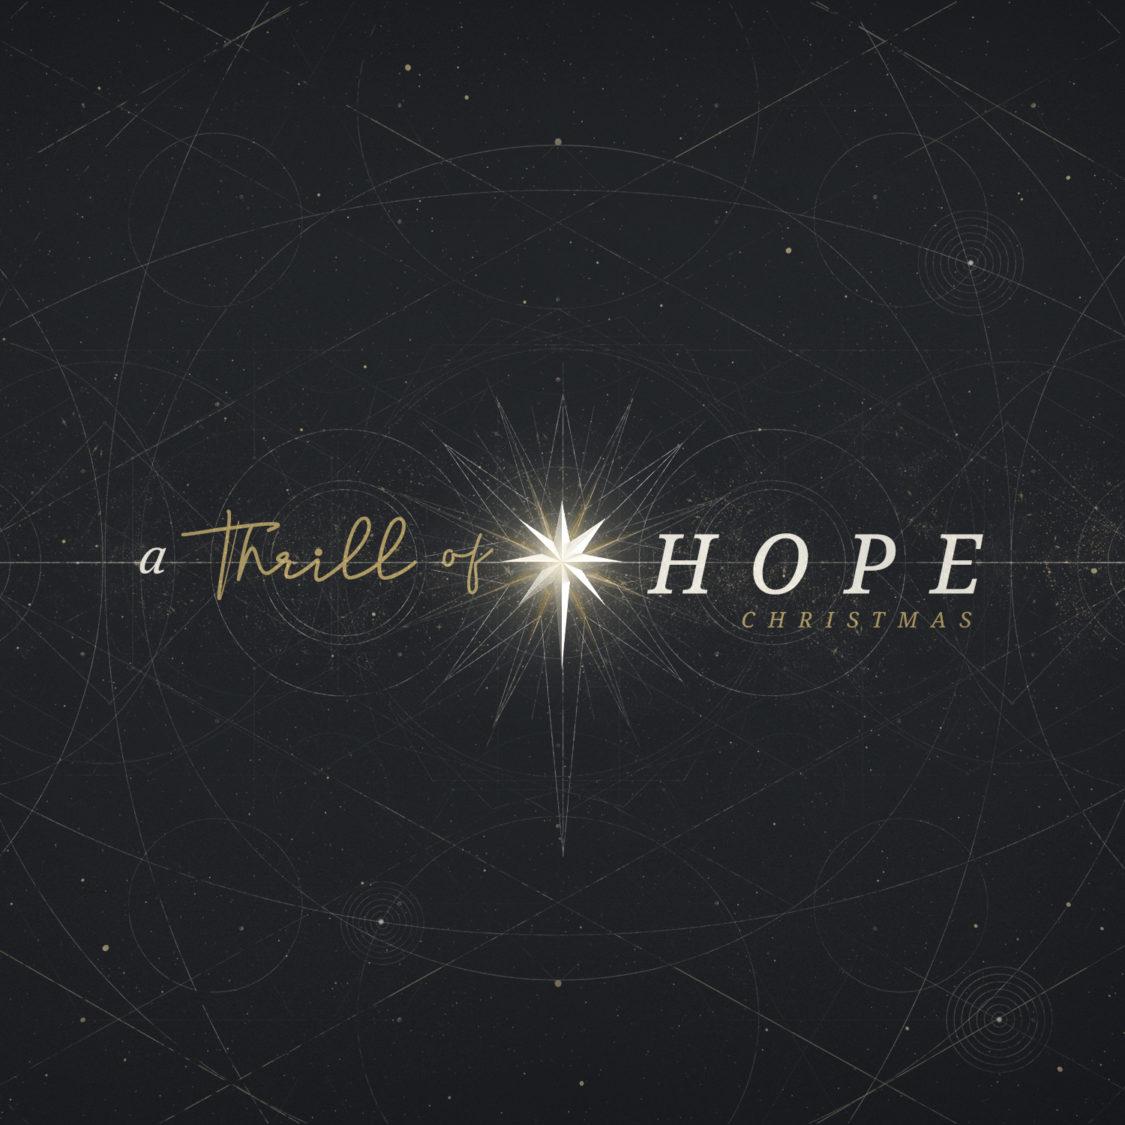 Lake Pointe Church Christmas Service 2020 The Thrill of Hope – Christmas Eve Service | Lakepointe Church